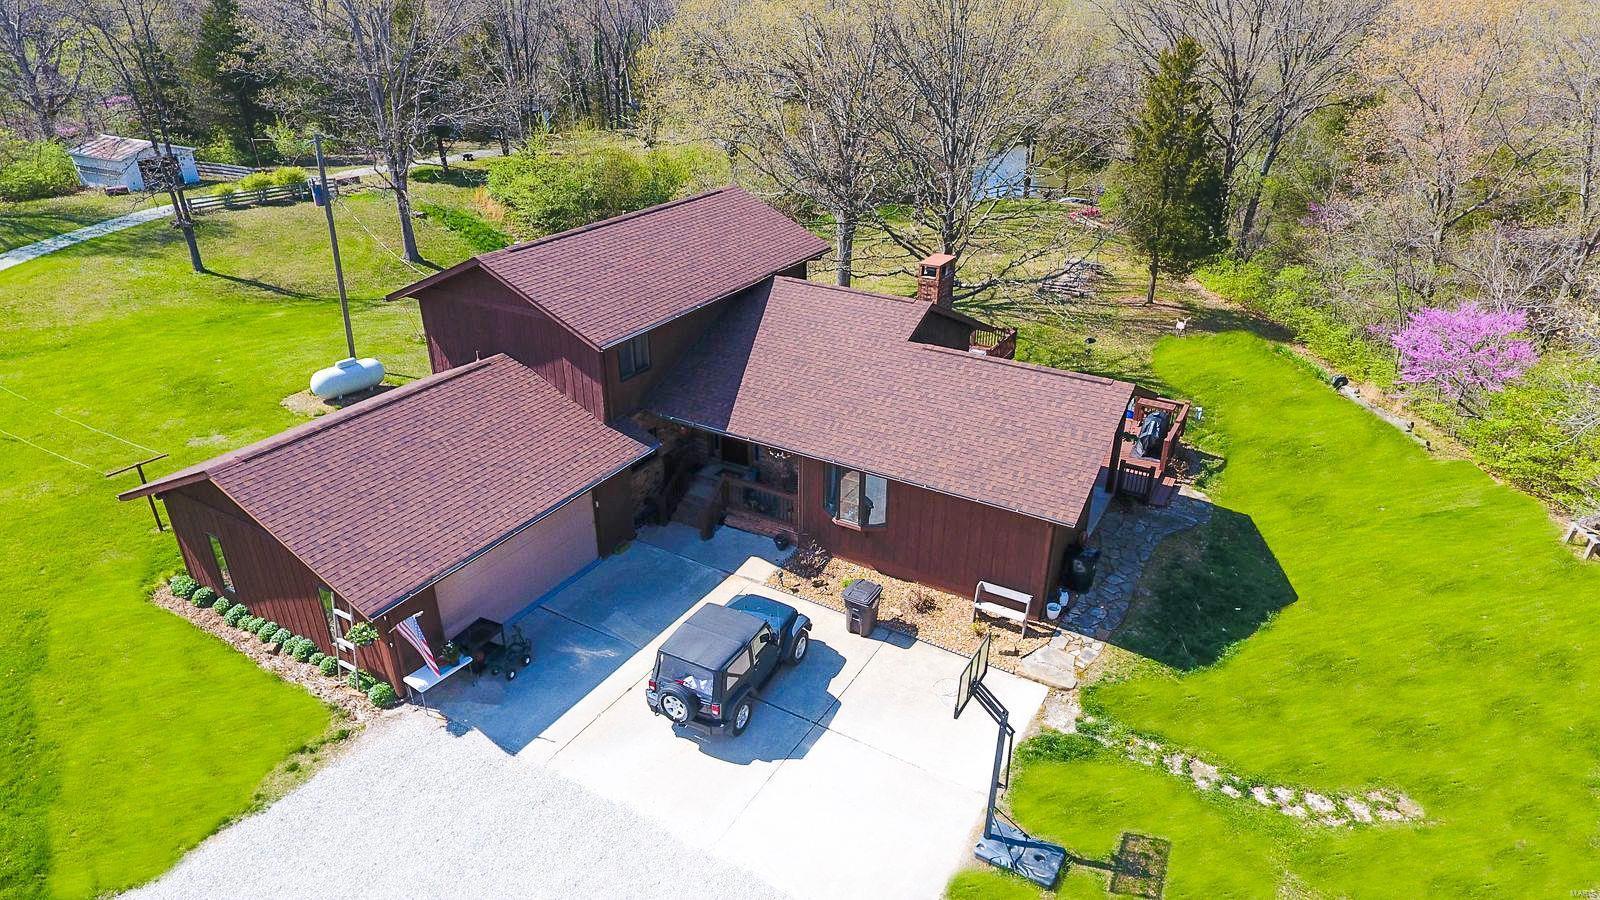 17710 VFW Rd Property Photo - Staunton, IL real estate listing